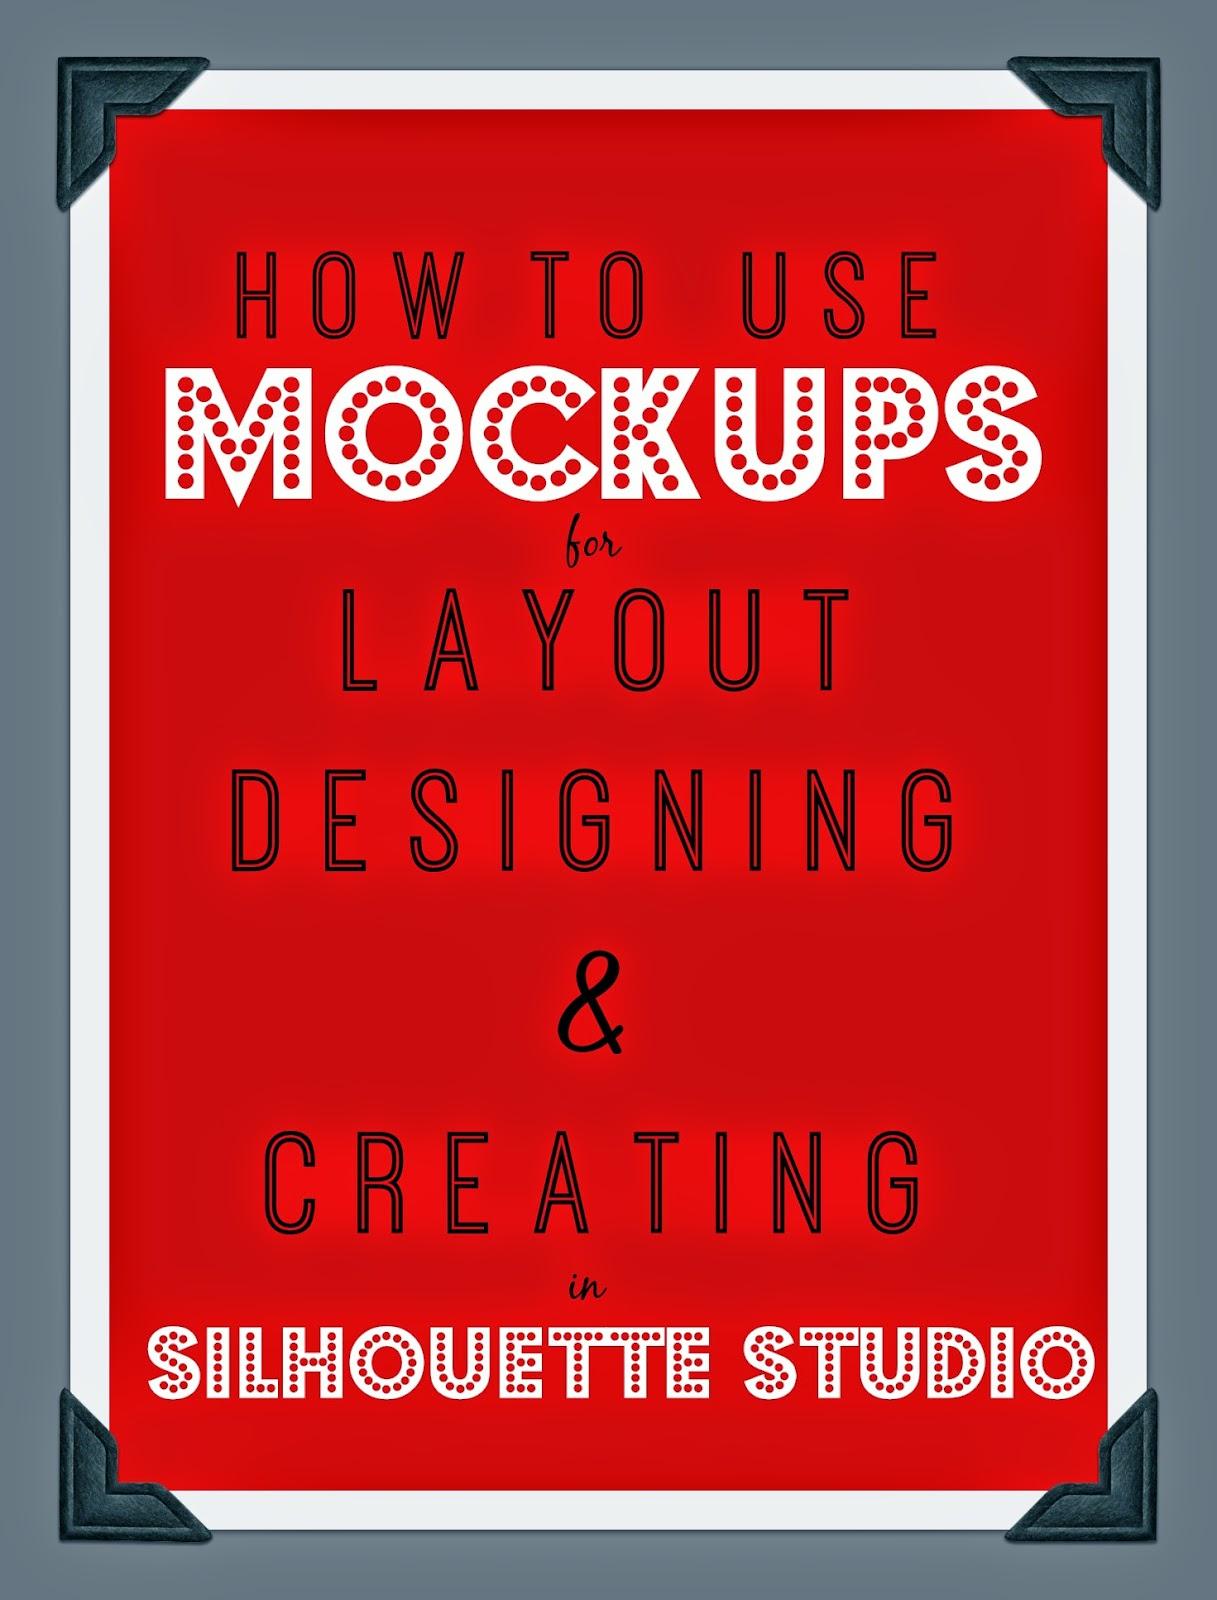 Mock-ups, mock ups, Silhouette Studio, designing, creating, layout